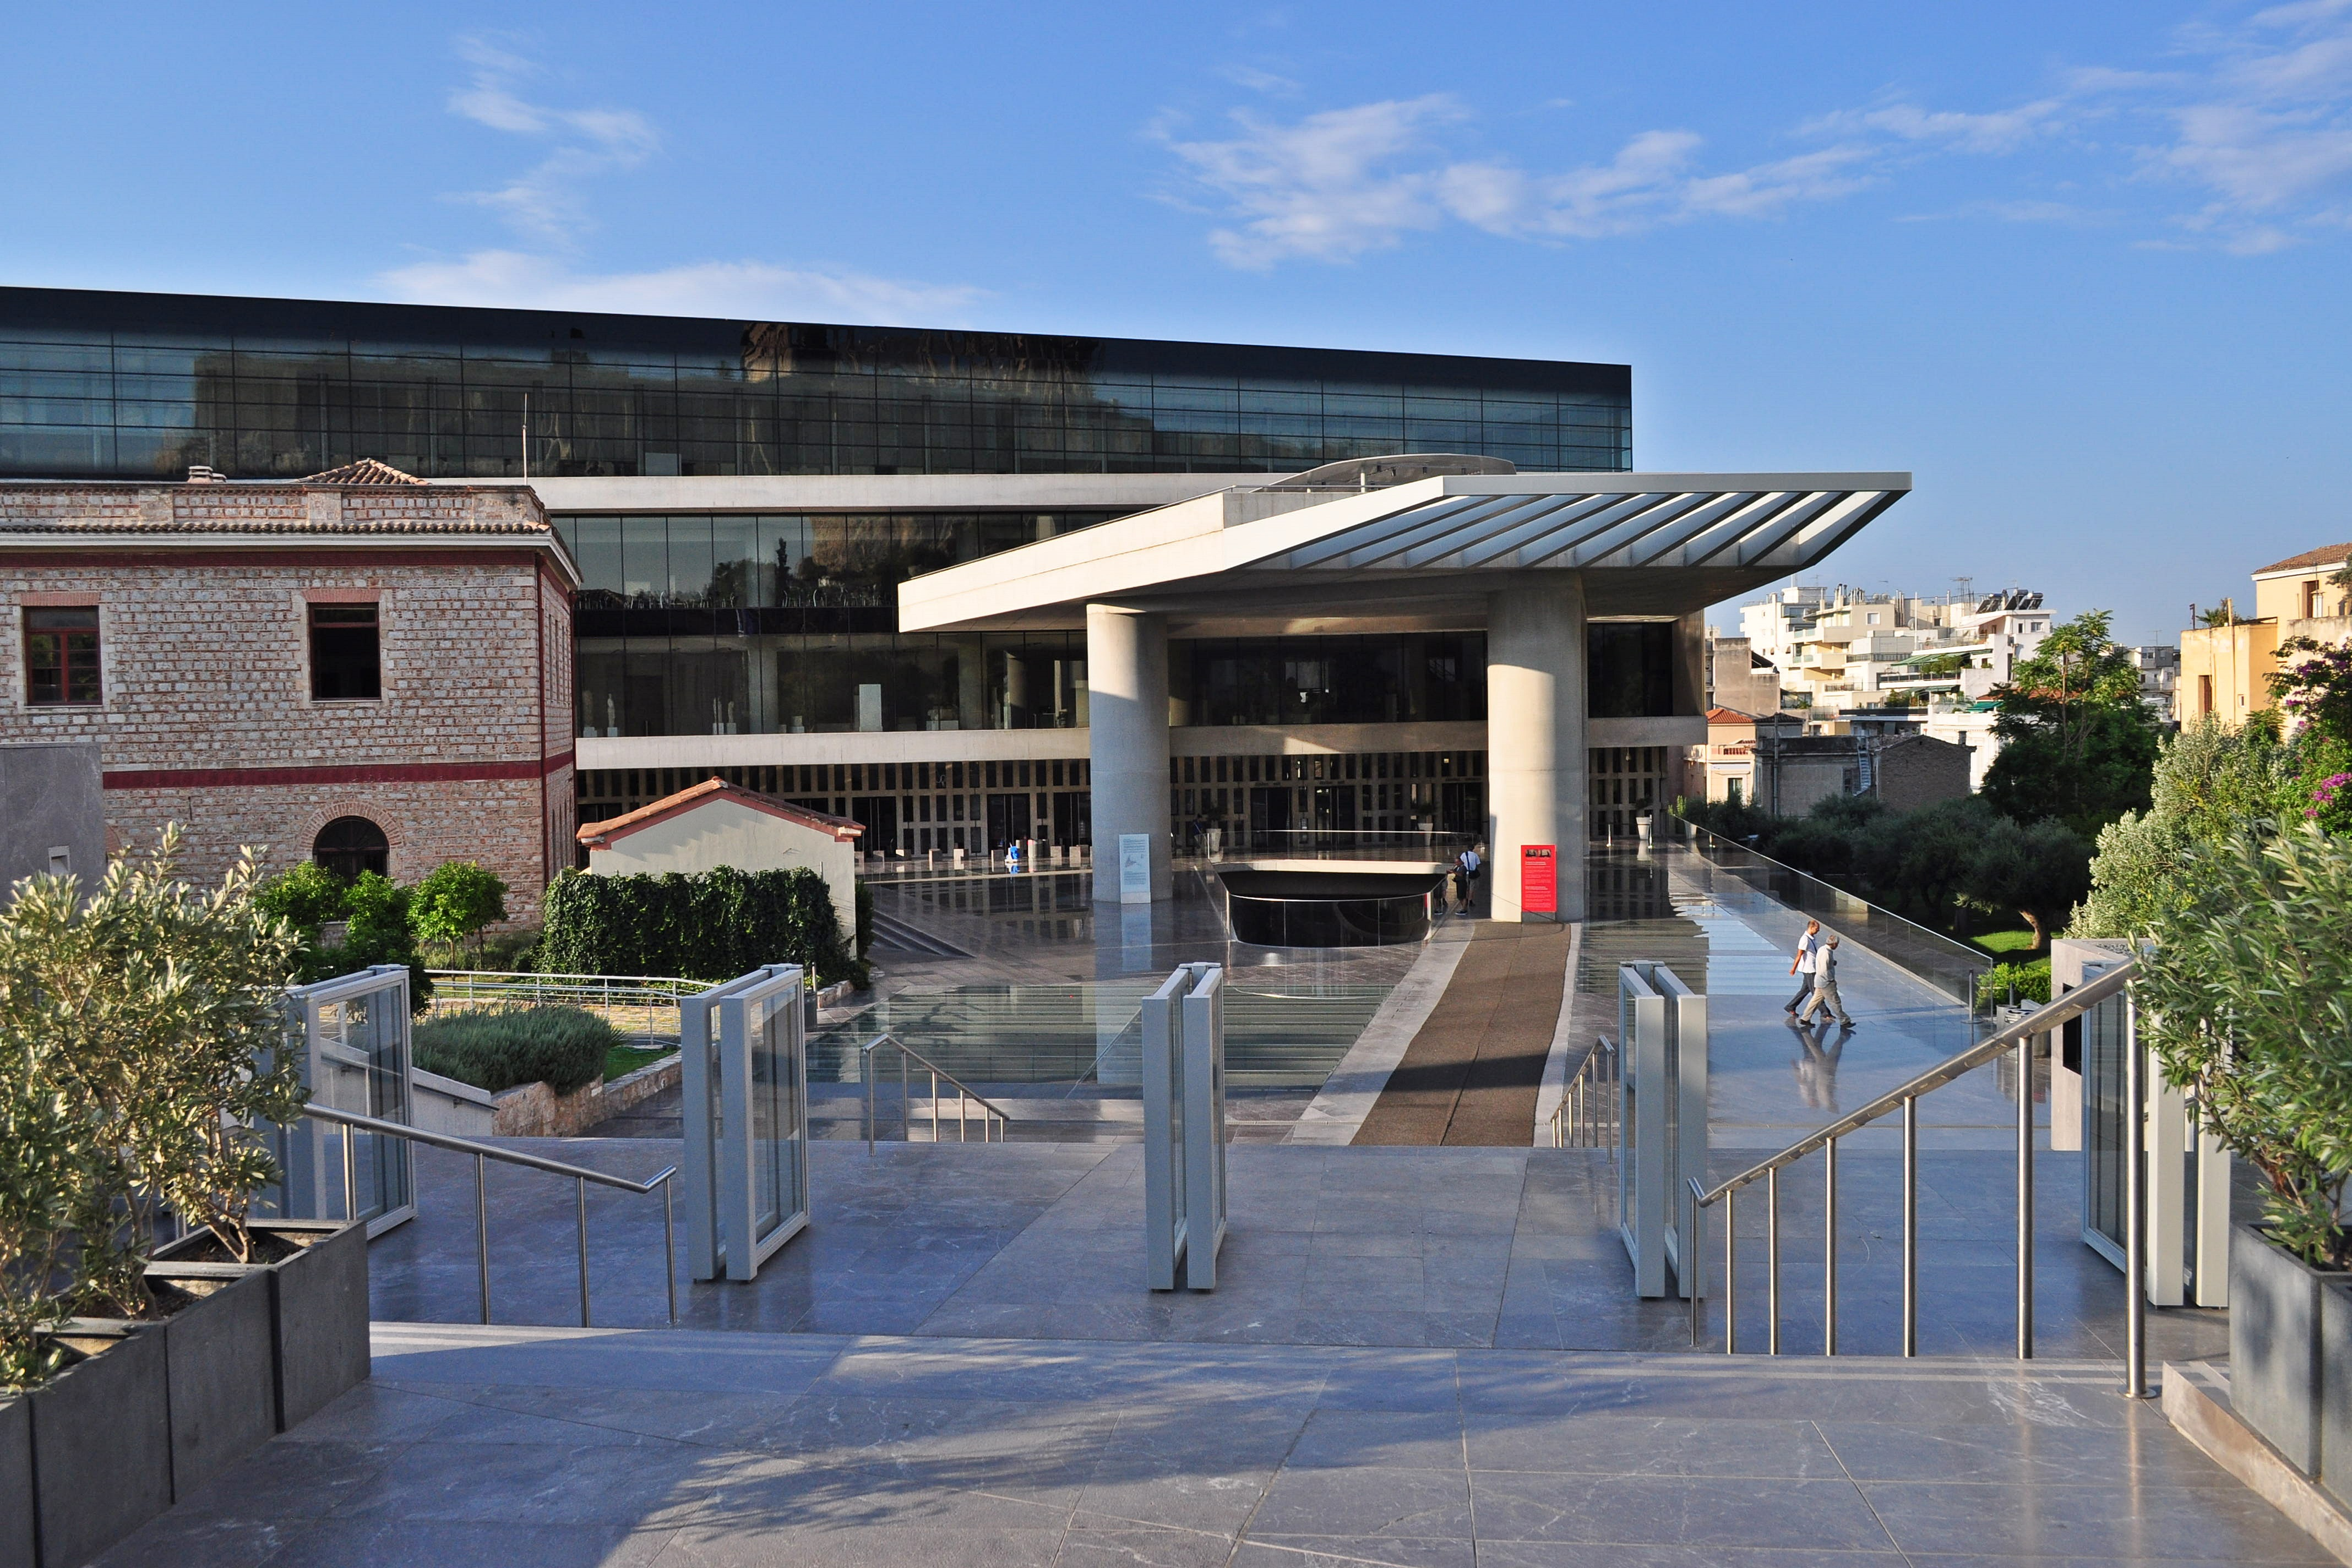 New Acropolis Museum Cafe